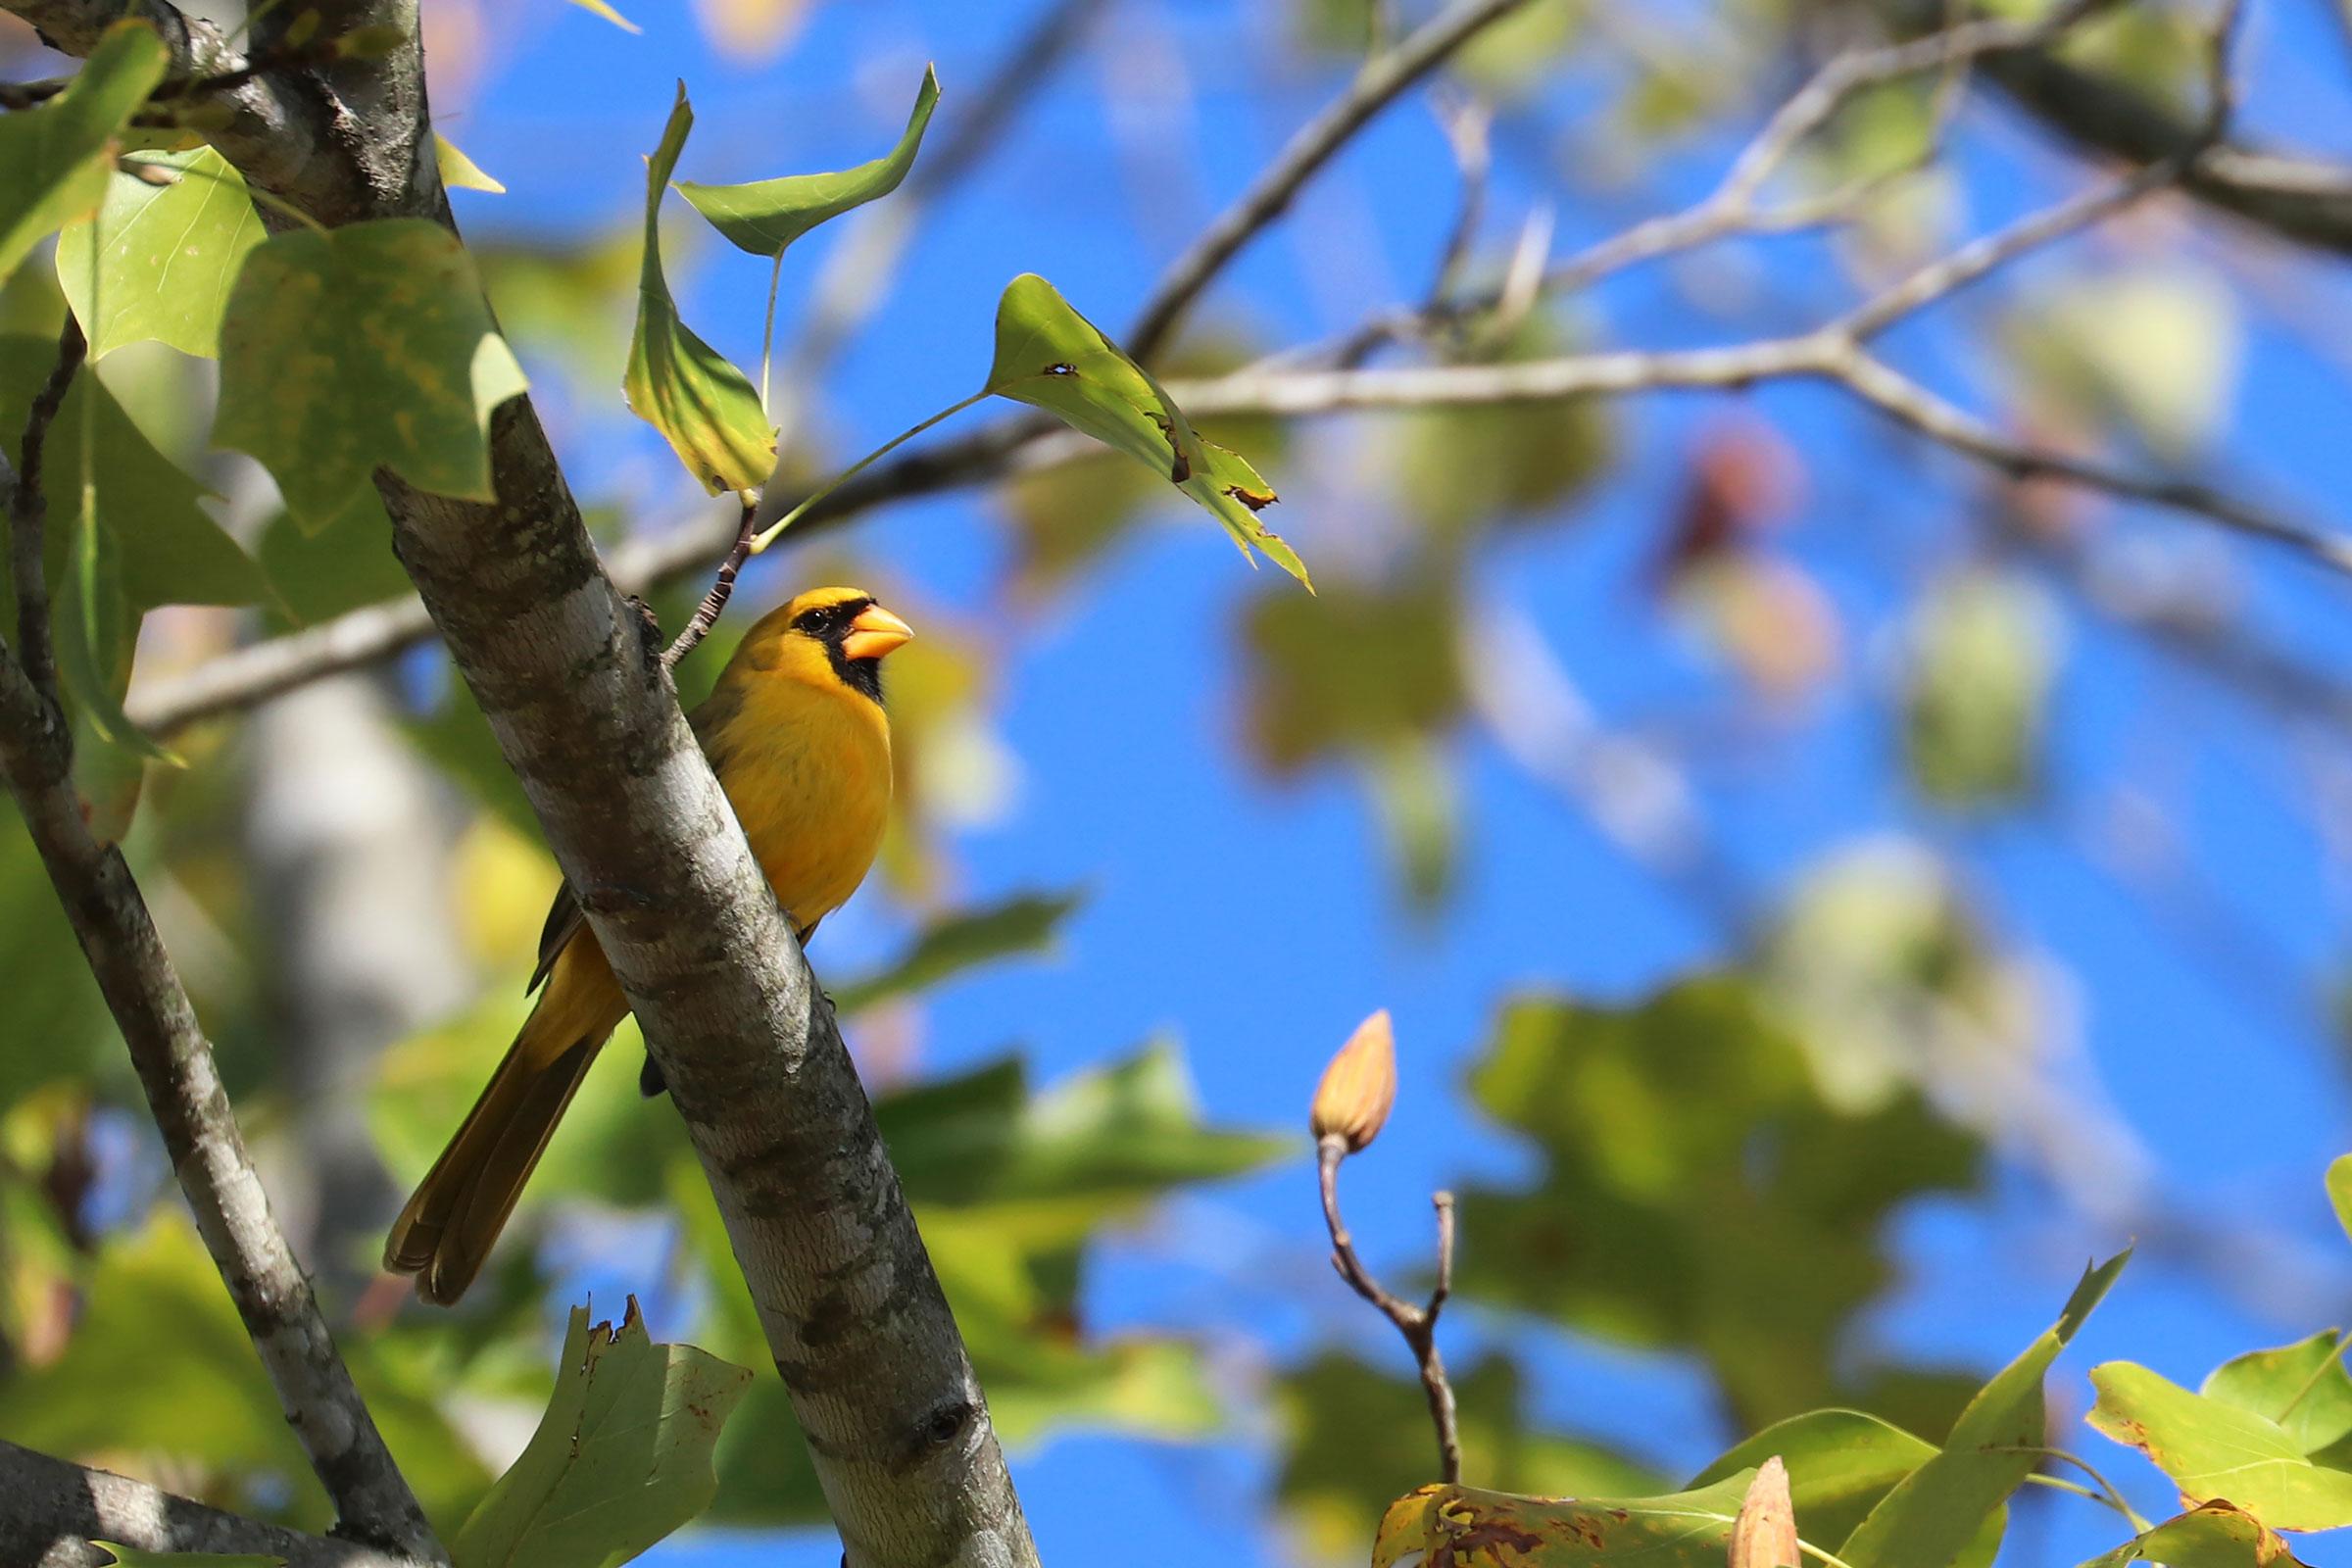 A yellow Northern Cardinal. Jeremy Black Photography